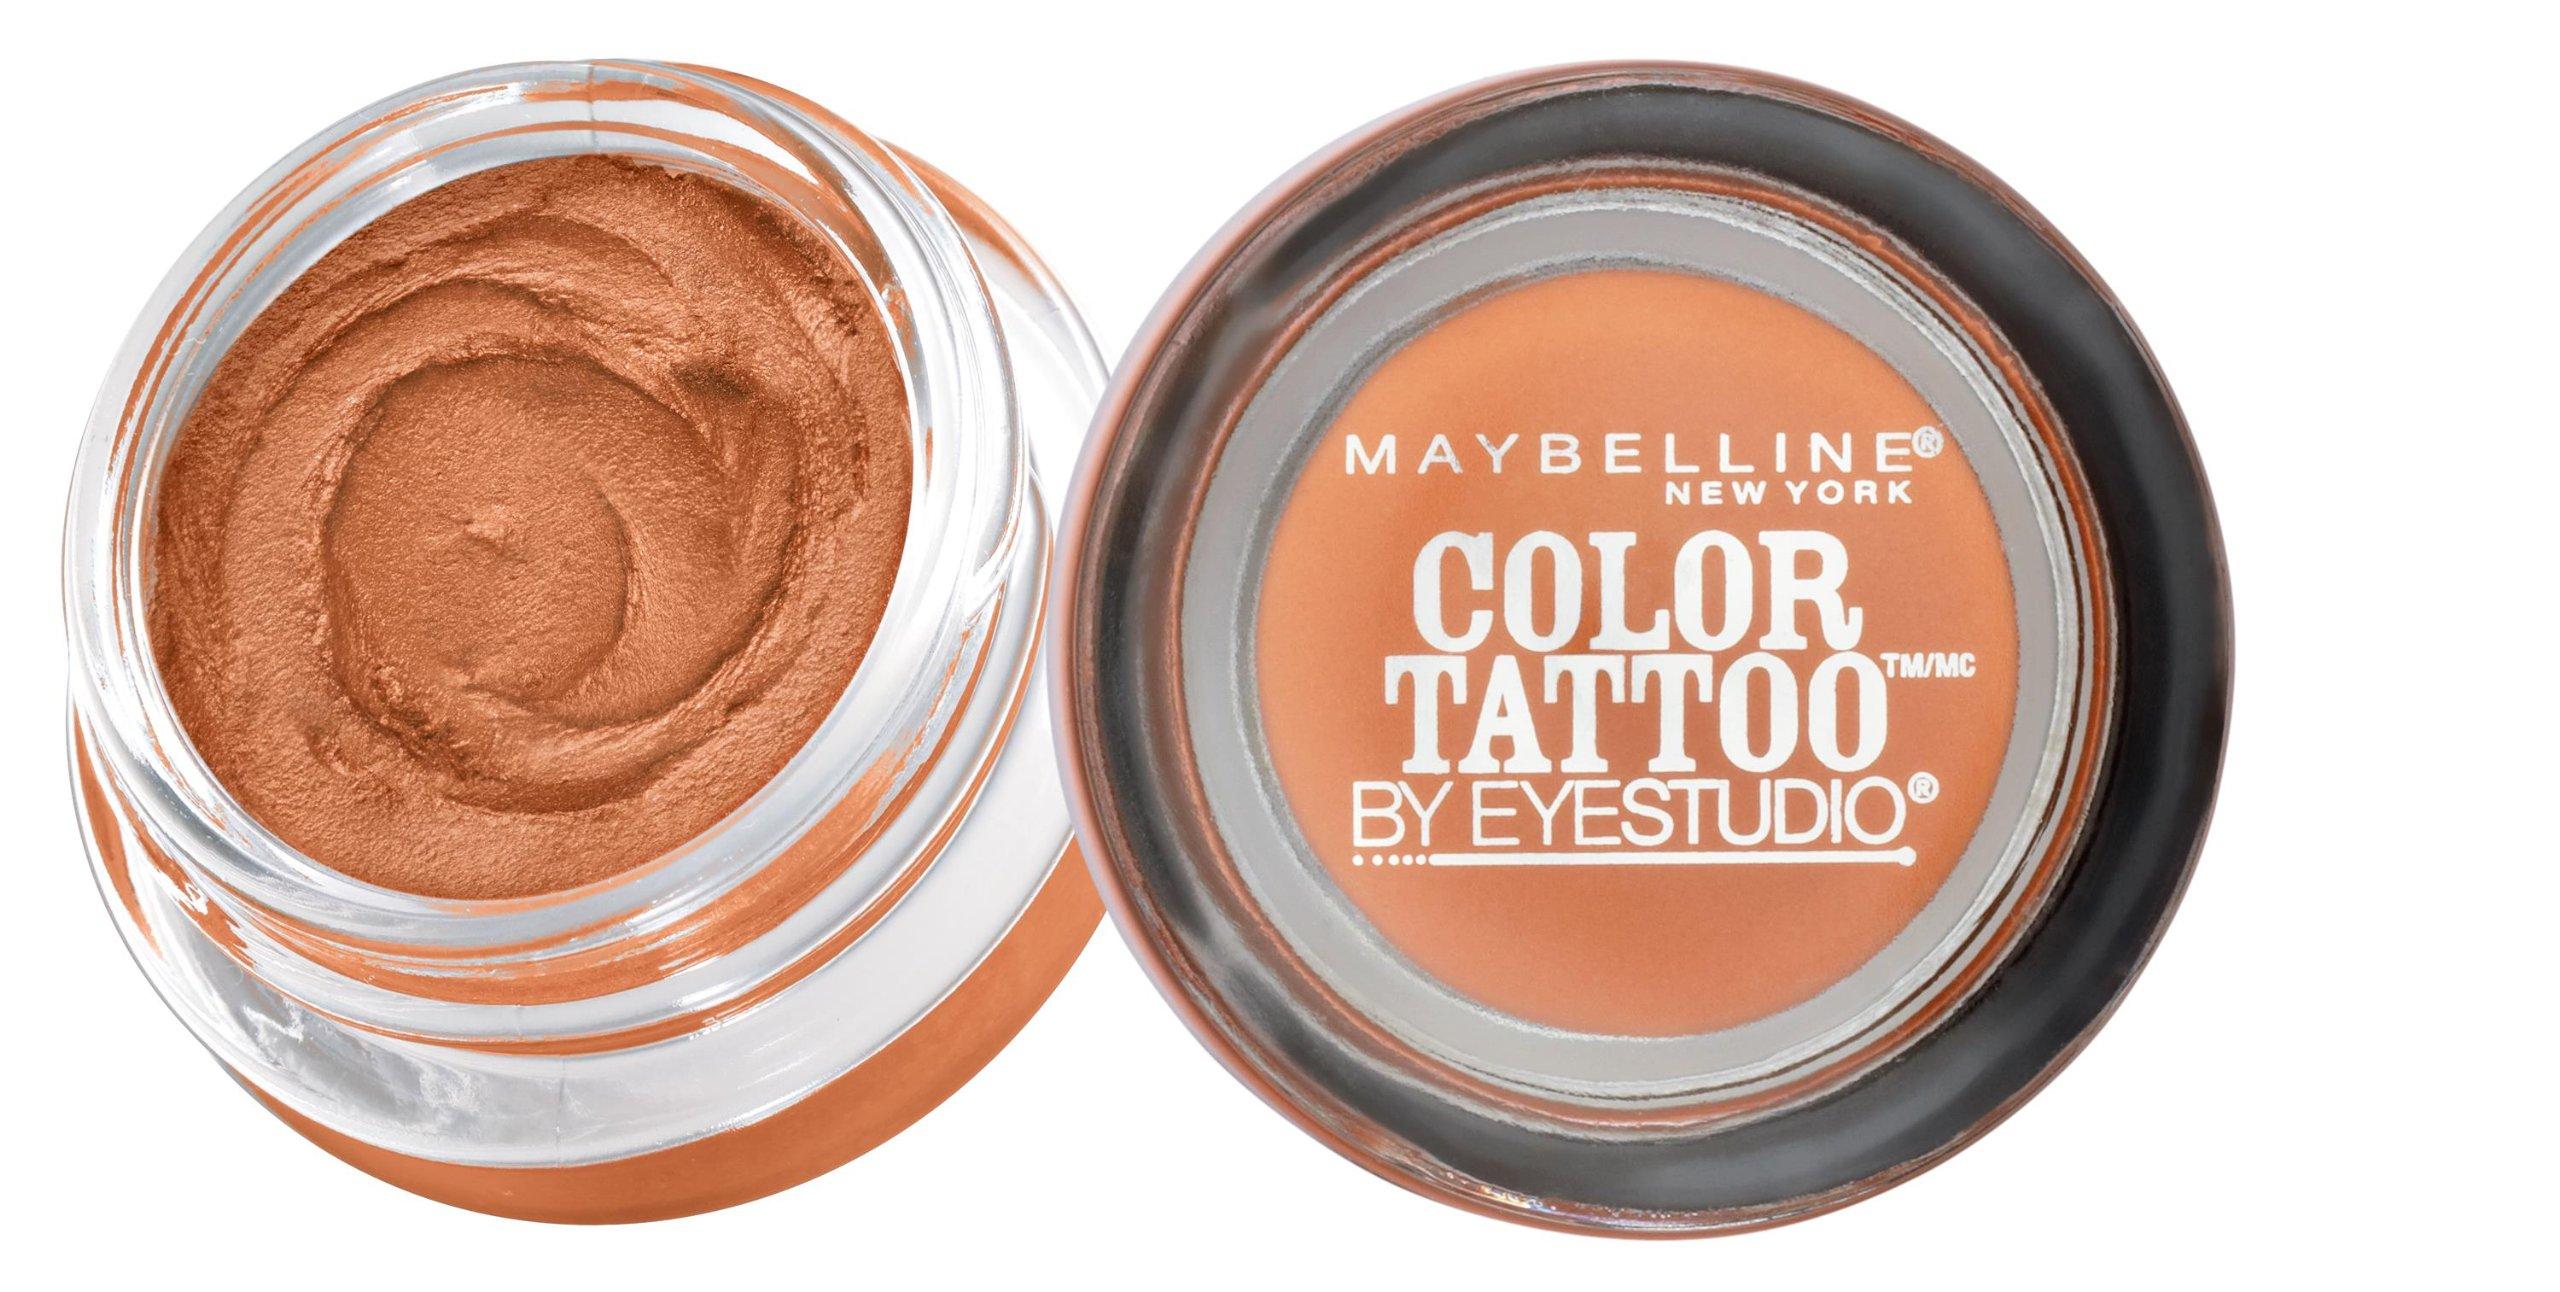 Maybelline New York Eyestudio ColorTattoo Metal 24HR Cream Gel Eyeshadow, Fierce and Tangy, 0.14 Ounce (1 Count)